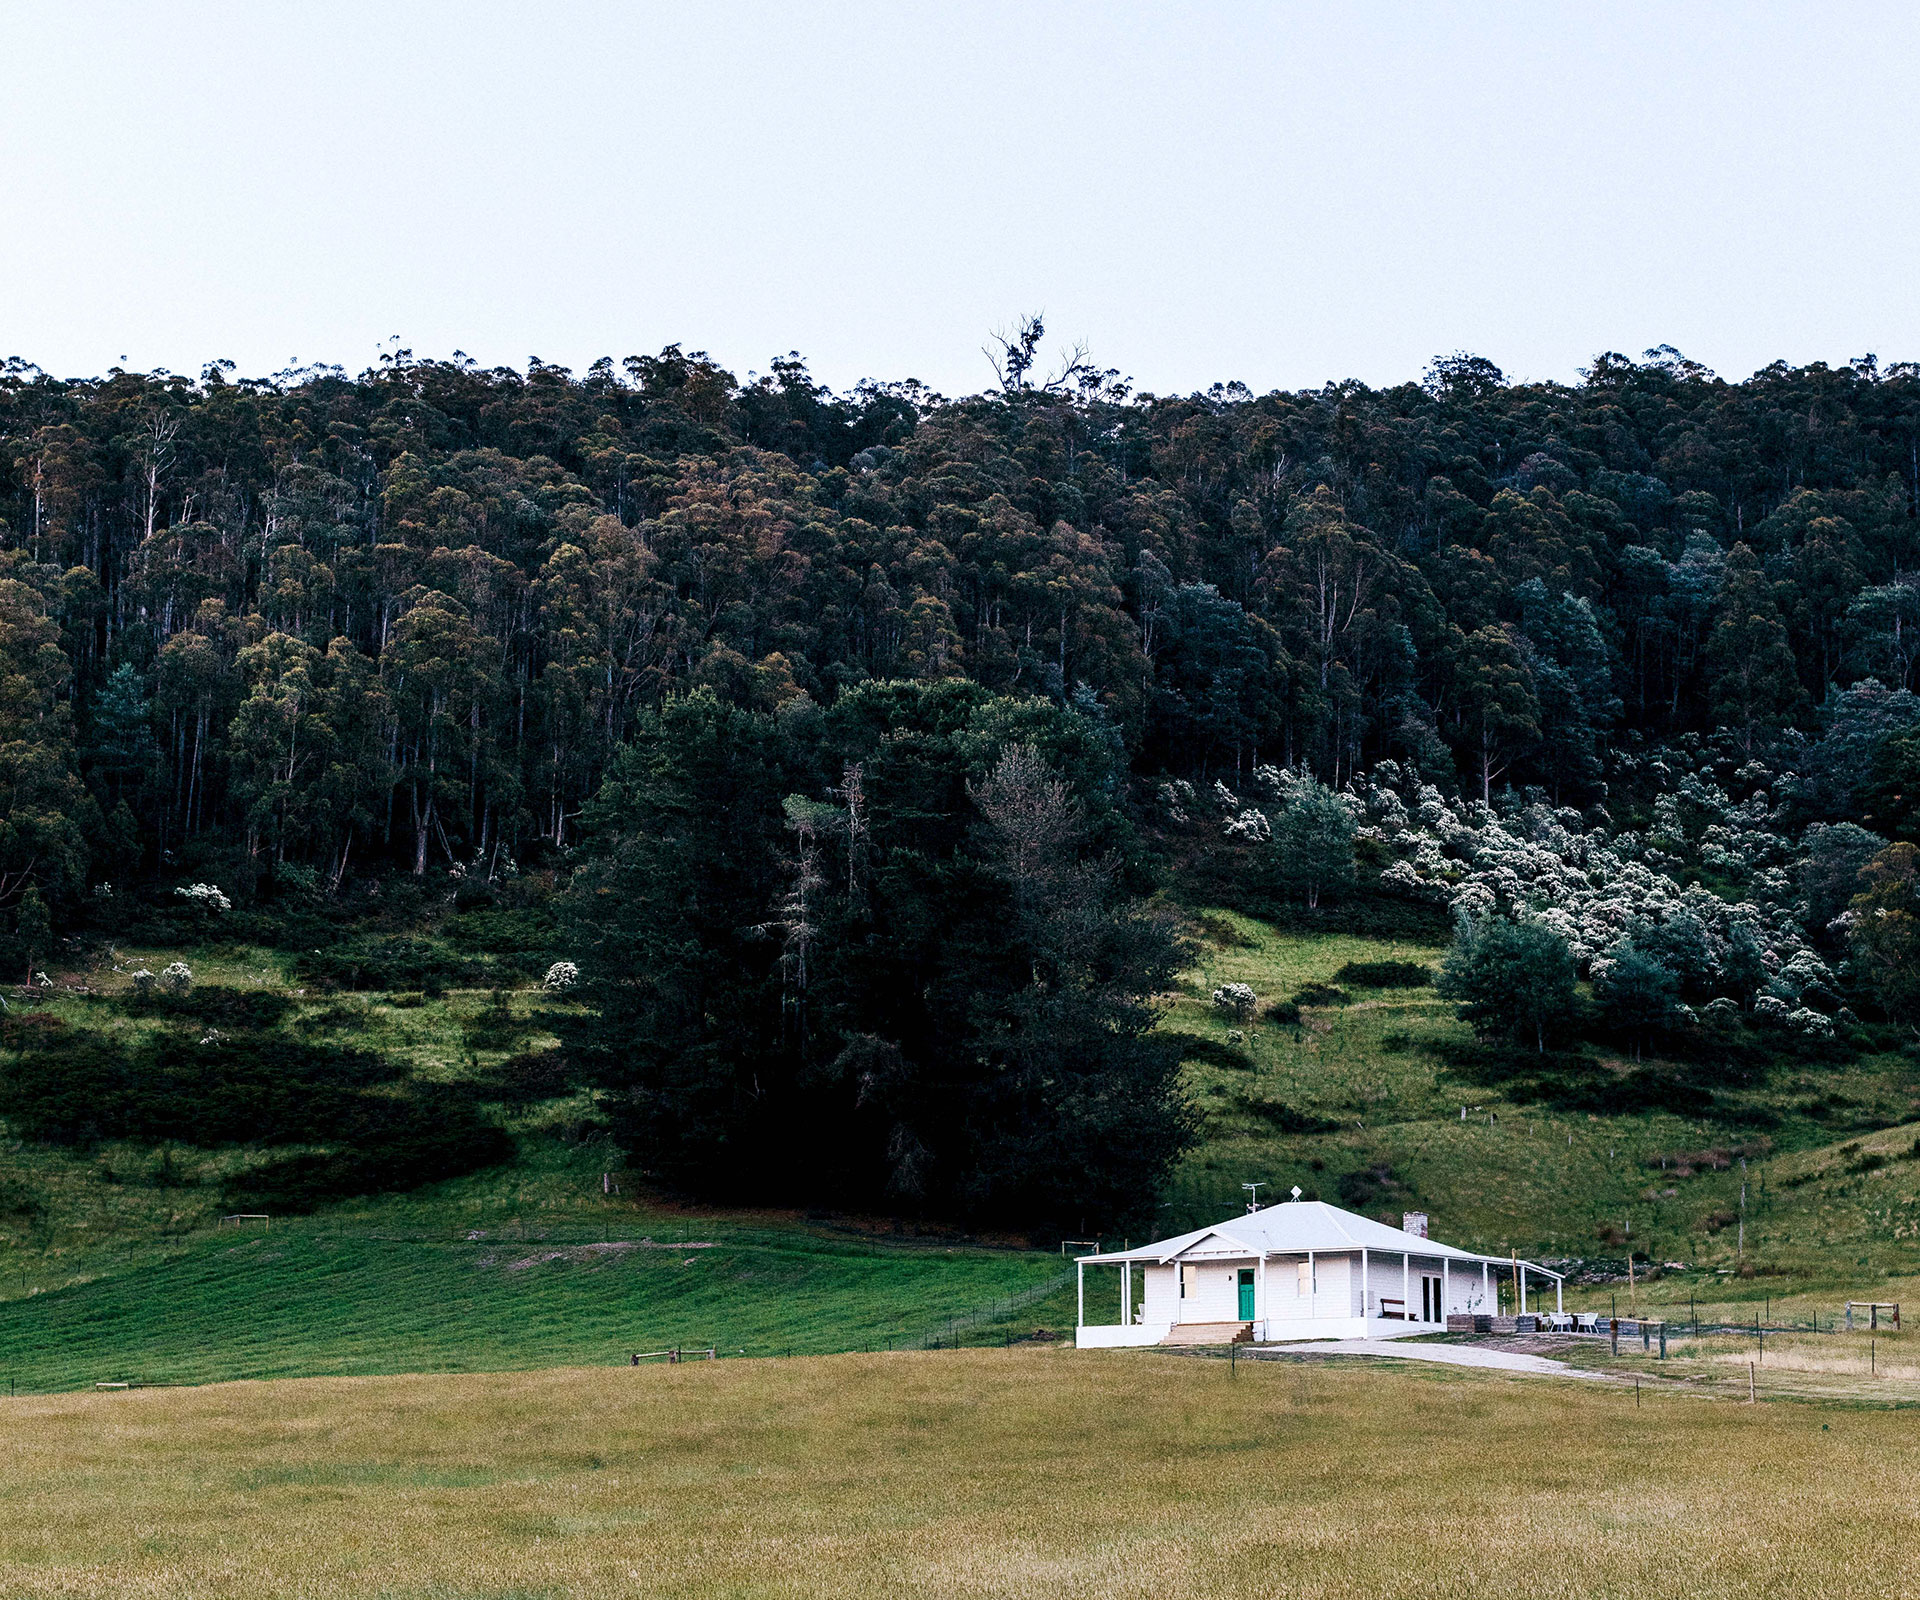 The restoration of a dilapidated farmhouse in Tasmania